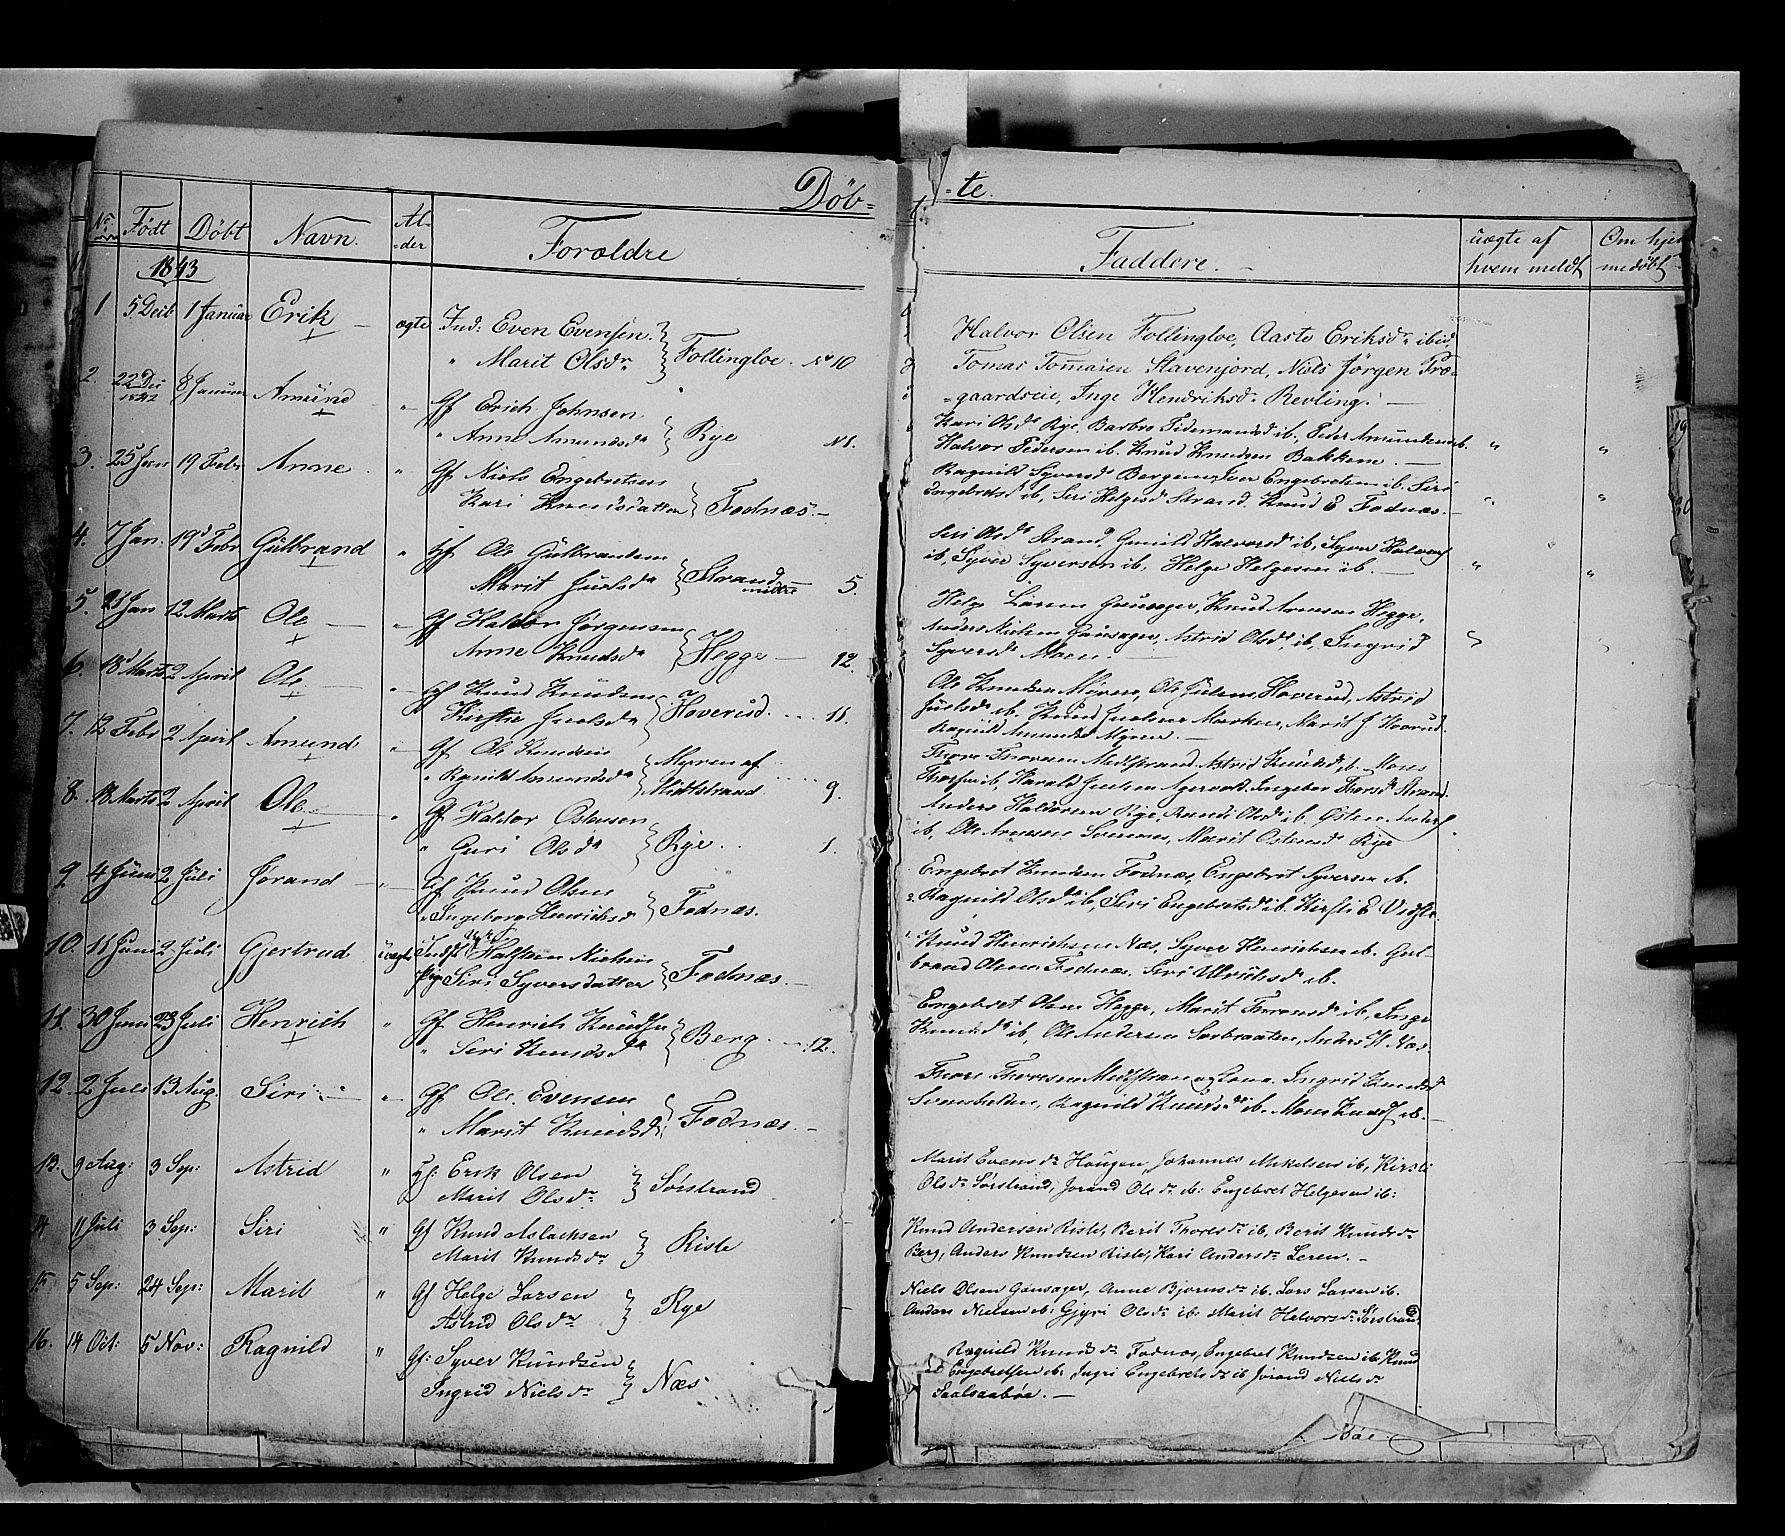 SAH, Nord-Aurdal prestekontor, Ministerialbok nr. 5, 1842-1863, s. 4